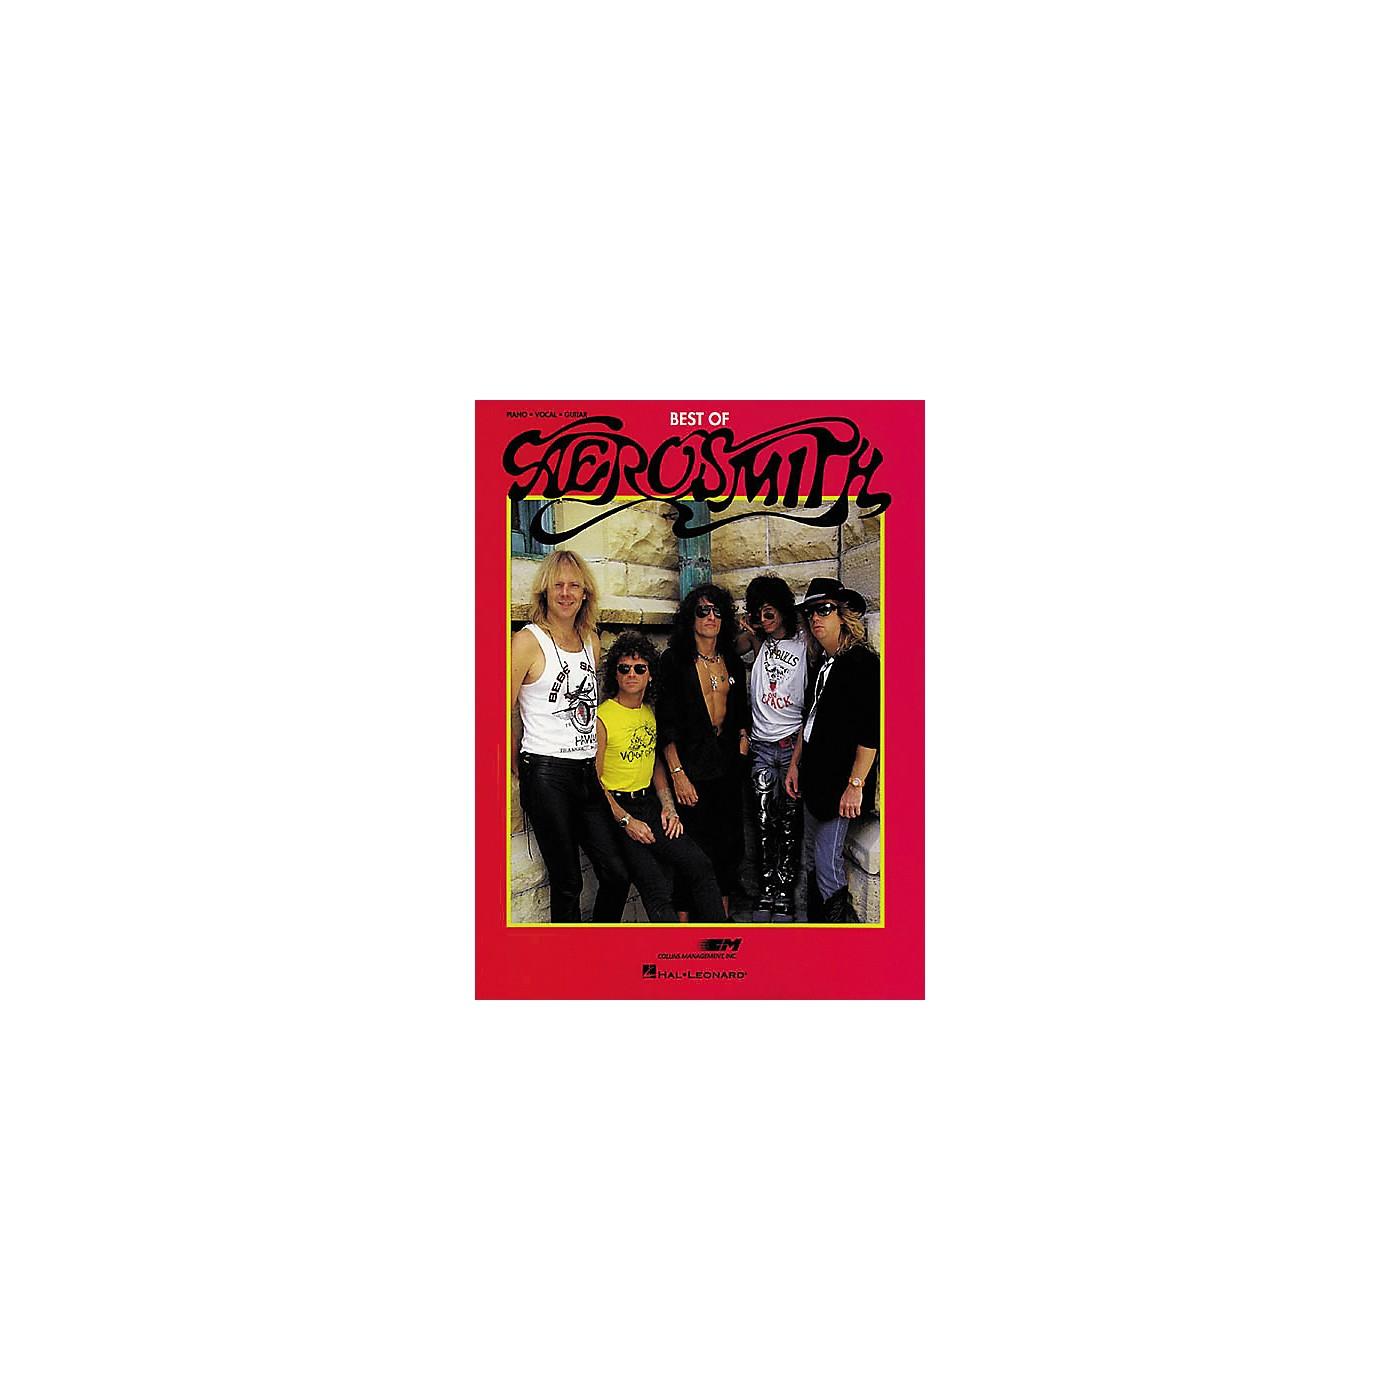 Hal Leonard The Best Of Aerosmith Piano/Vocal/Guitar Artist Songbook thumbnail